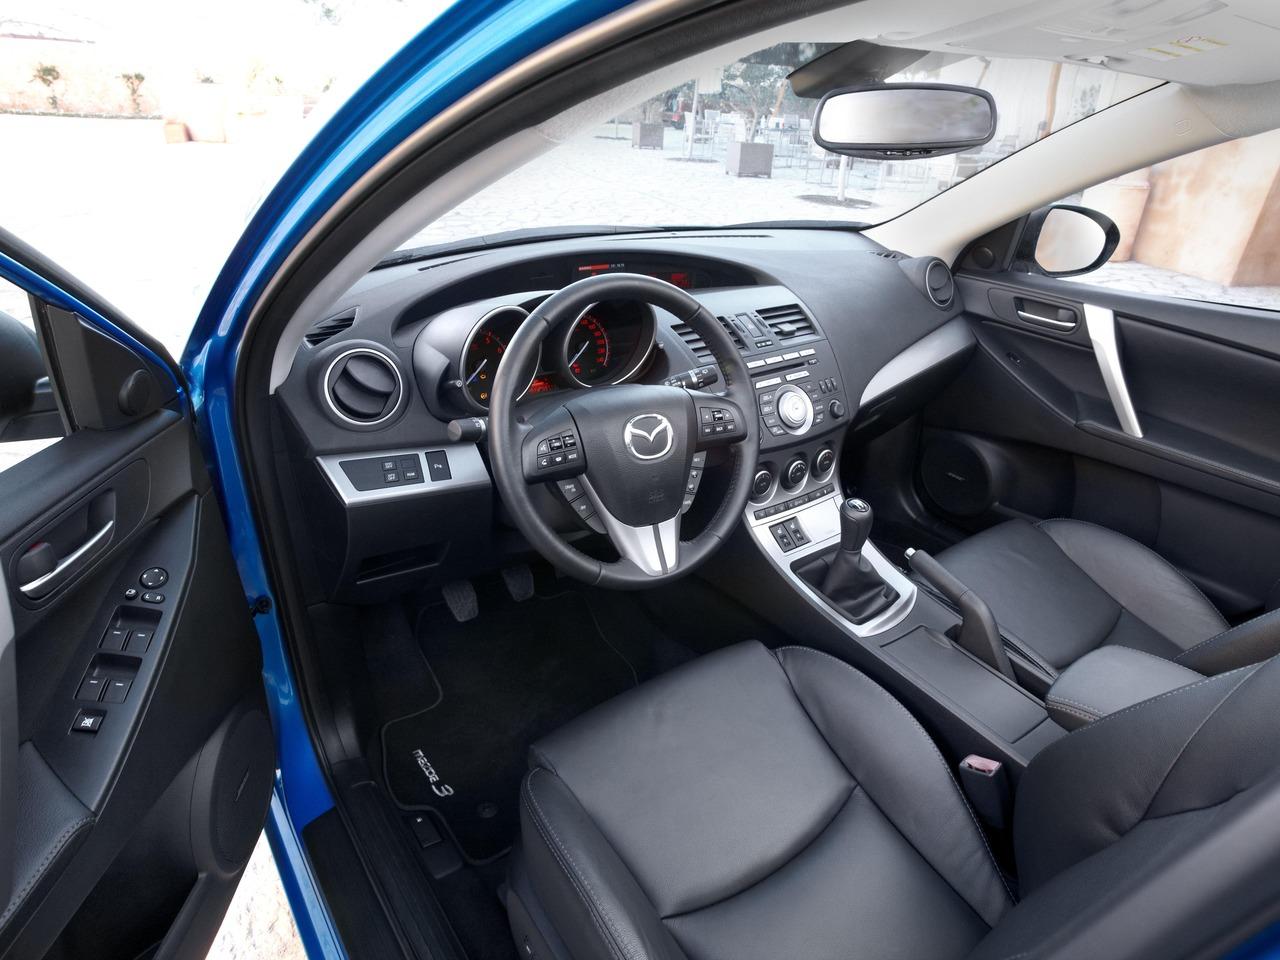 Снимки: Mazda Mazda 3 II Sedan